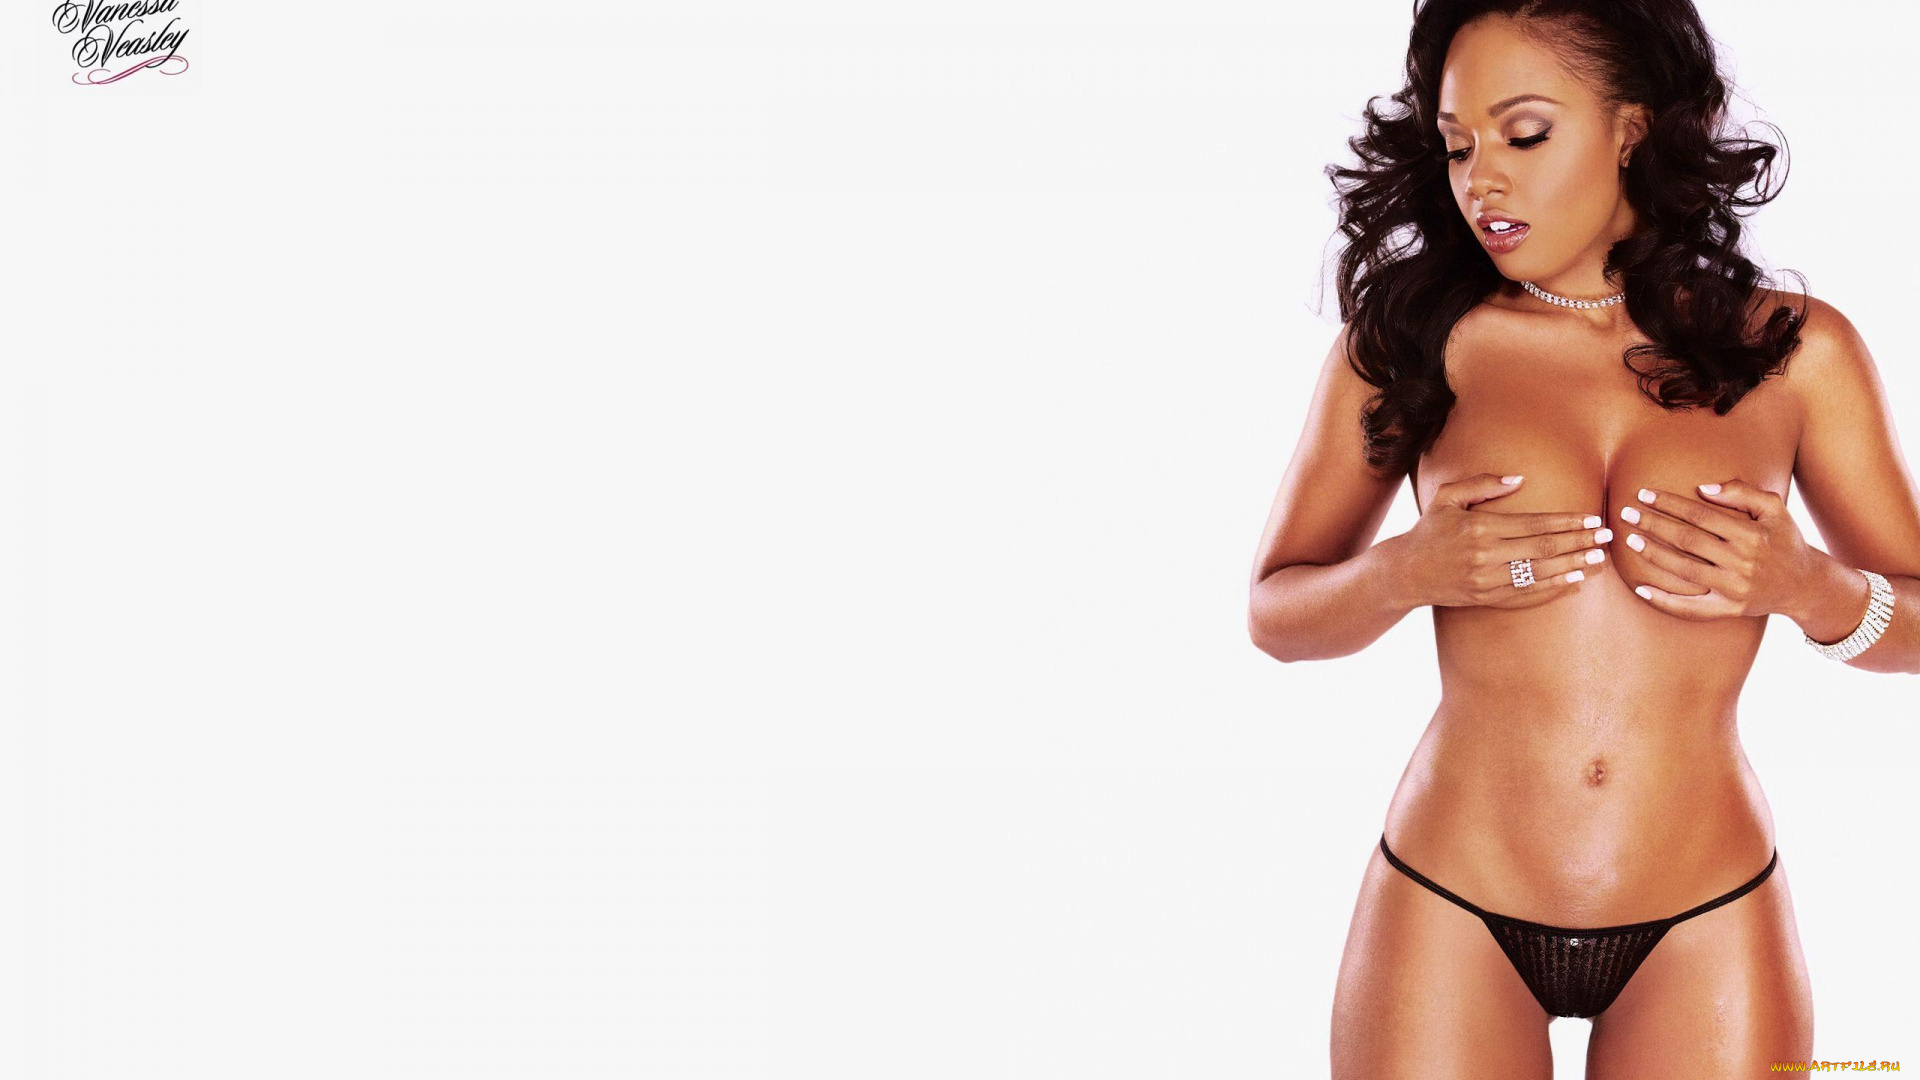 get-vanessa-veasley-nude-photos